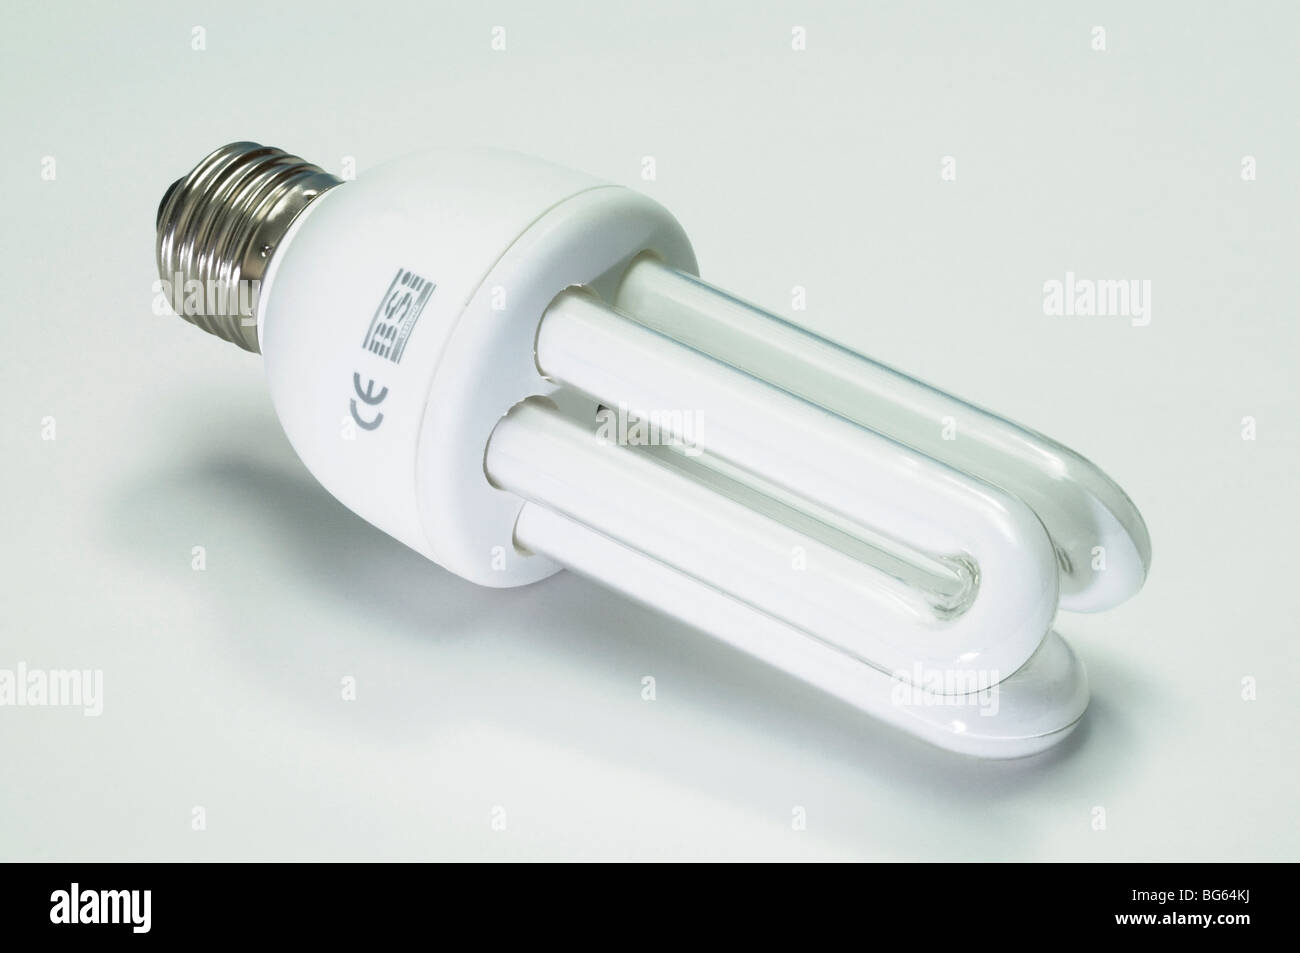 Energiesparlampe, Studio Bild. Stockbild